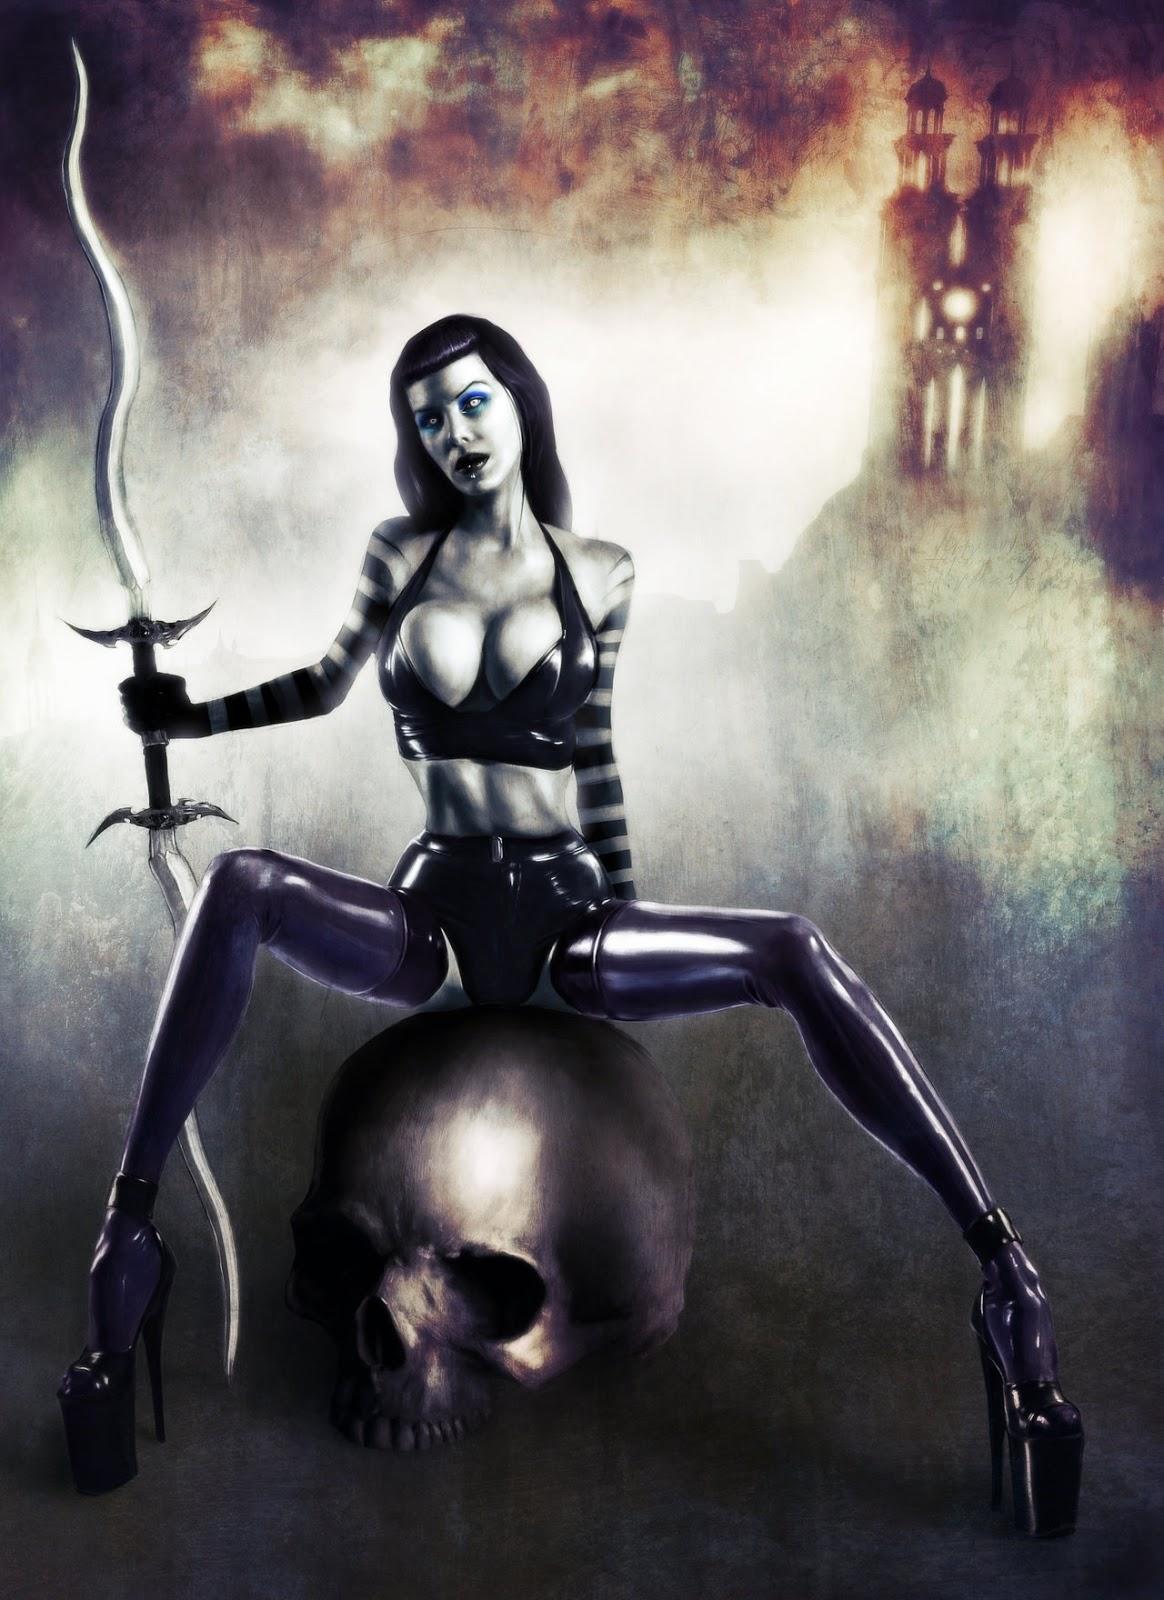 Nude girl heavy metal pics pornos scene